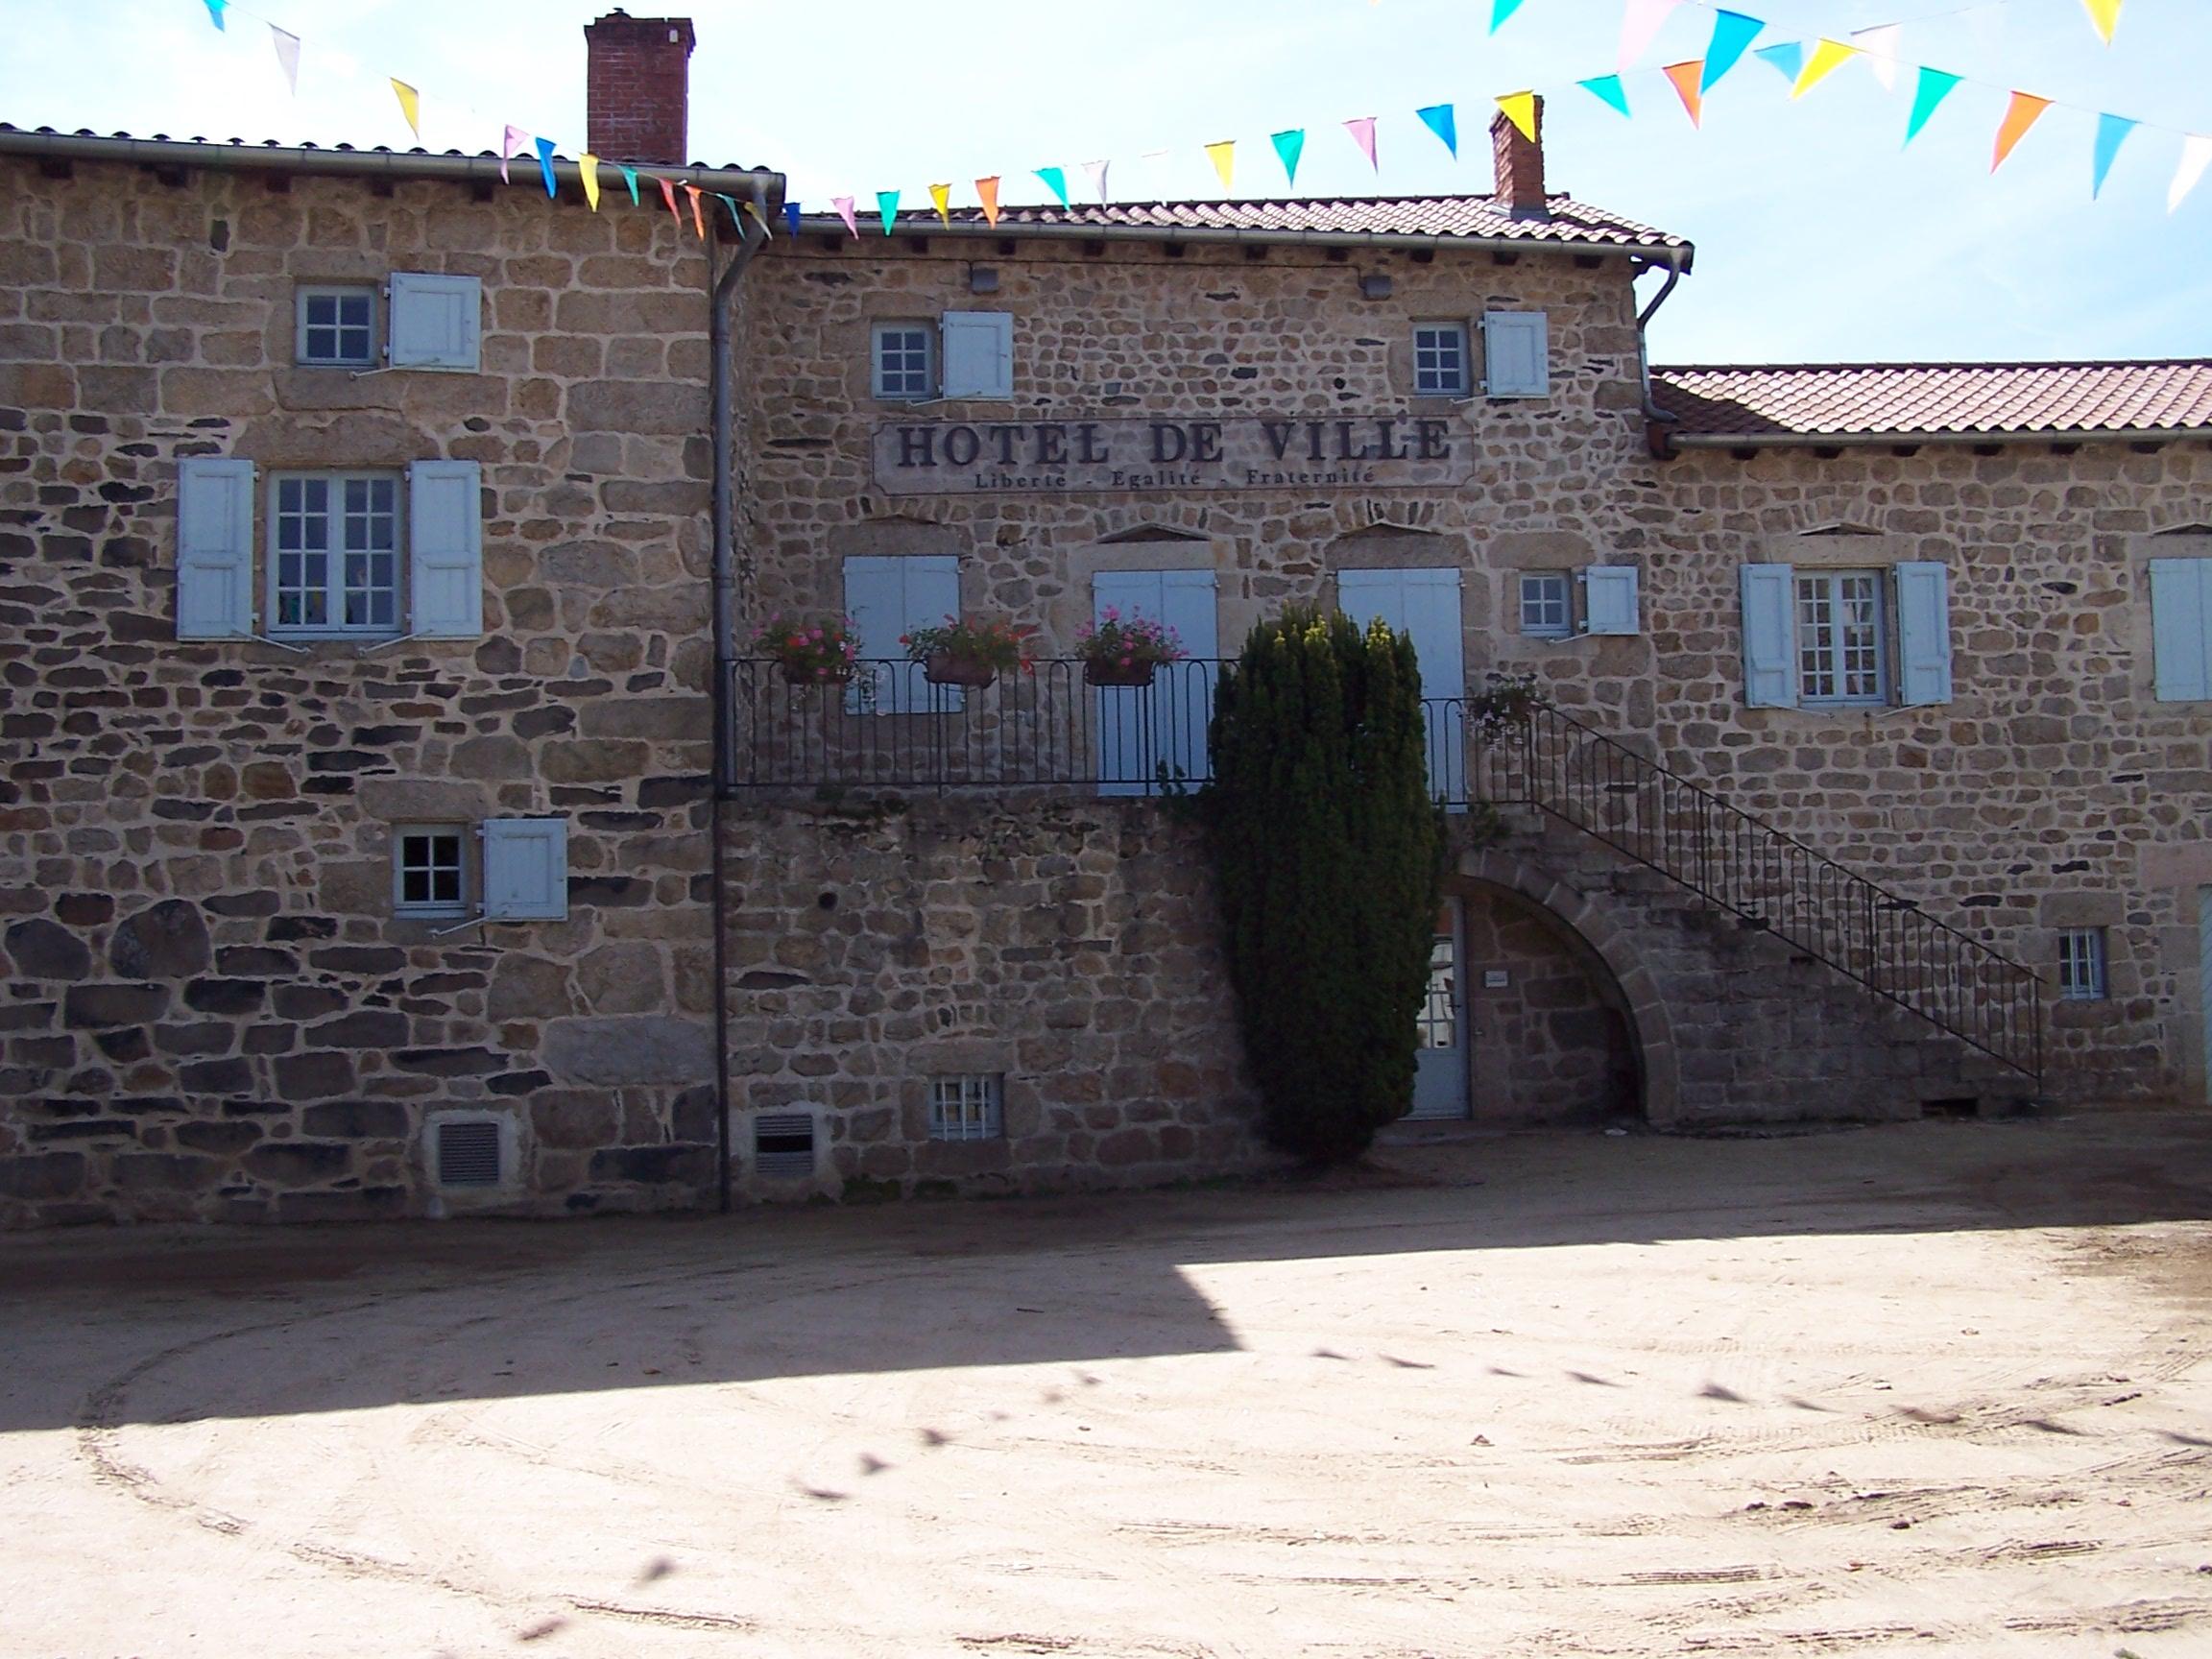 Sant Maurise (Alt Loira)